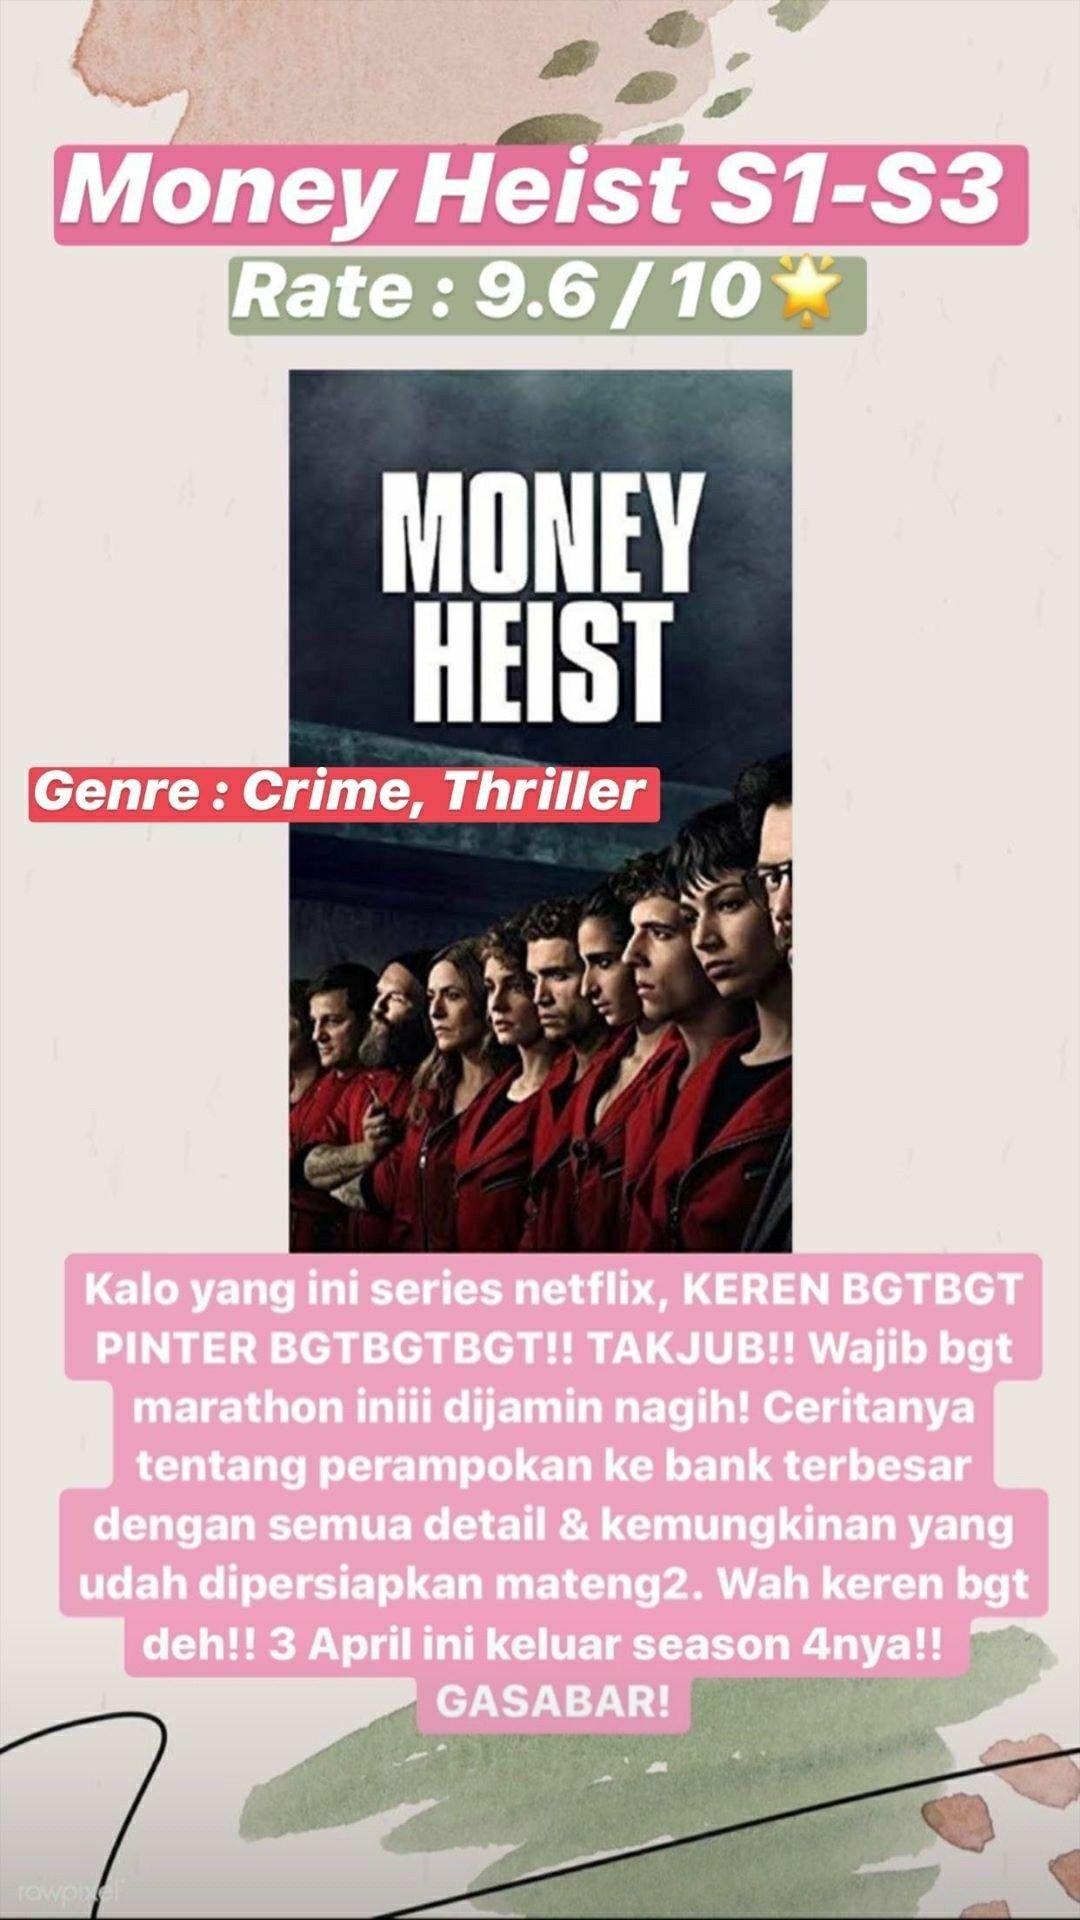 Money Heist Film Rekomendasi Di 2020 Film Remaja Teks Lucu Netflix